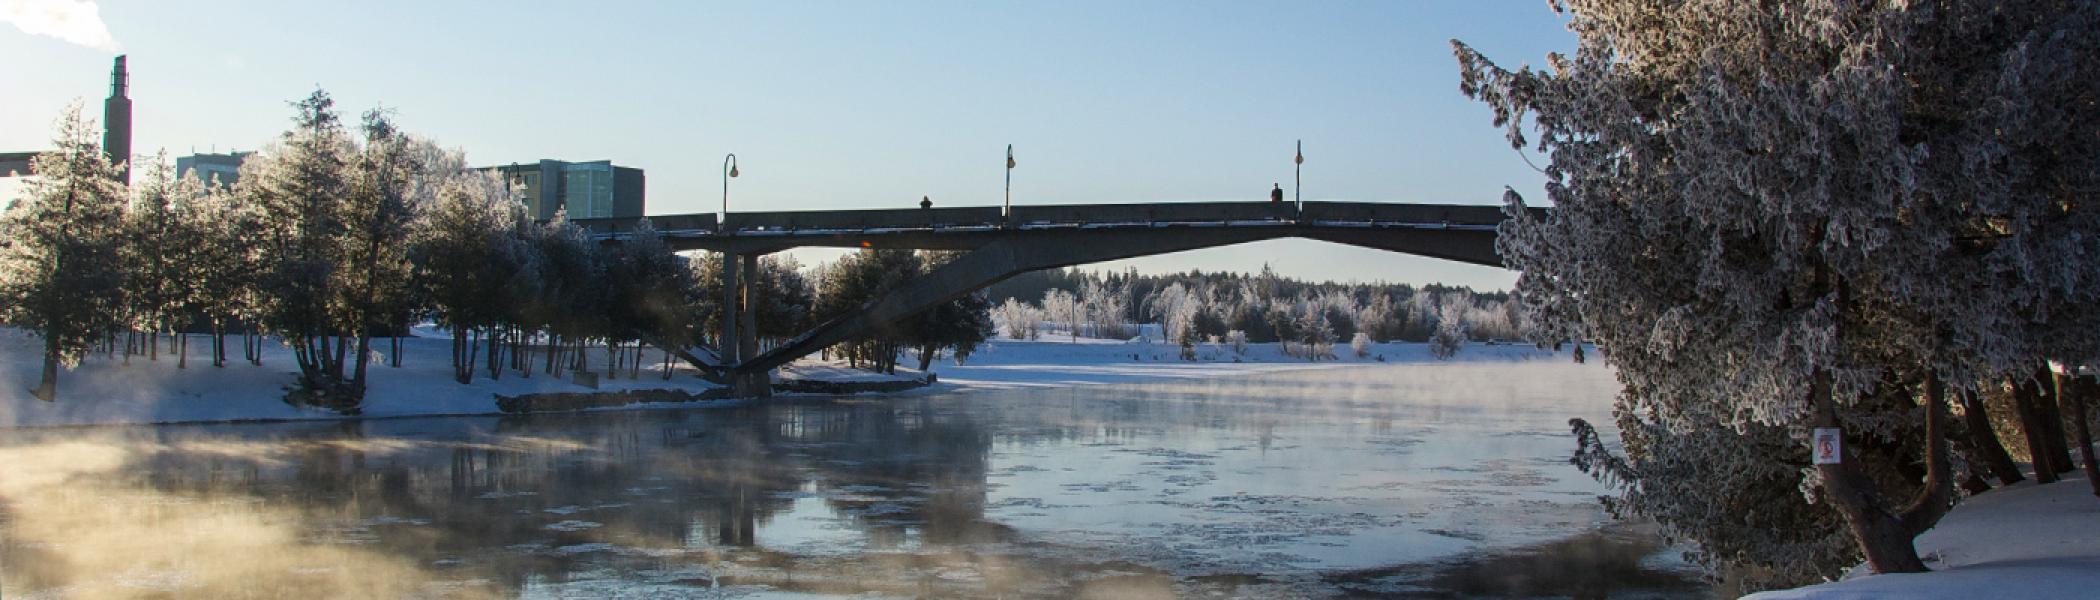 The Faryon bridge across the Otonabee river on a sonwy winter's morning